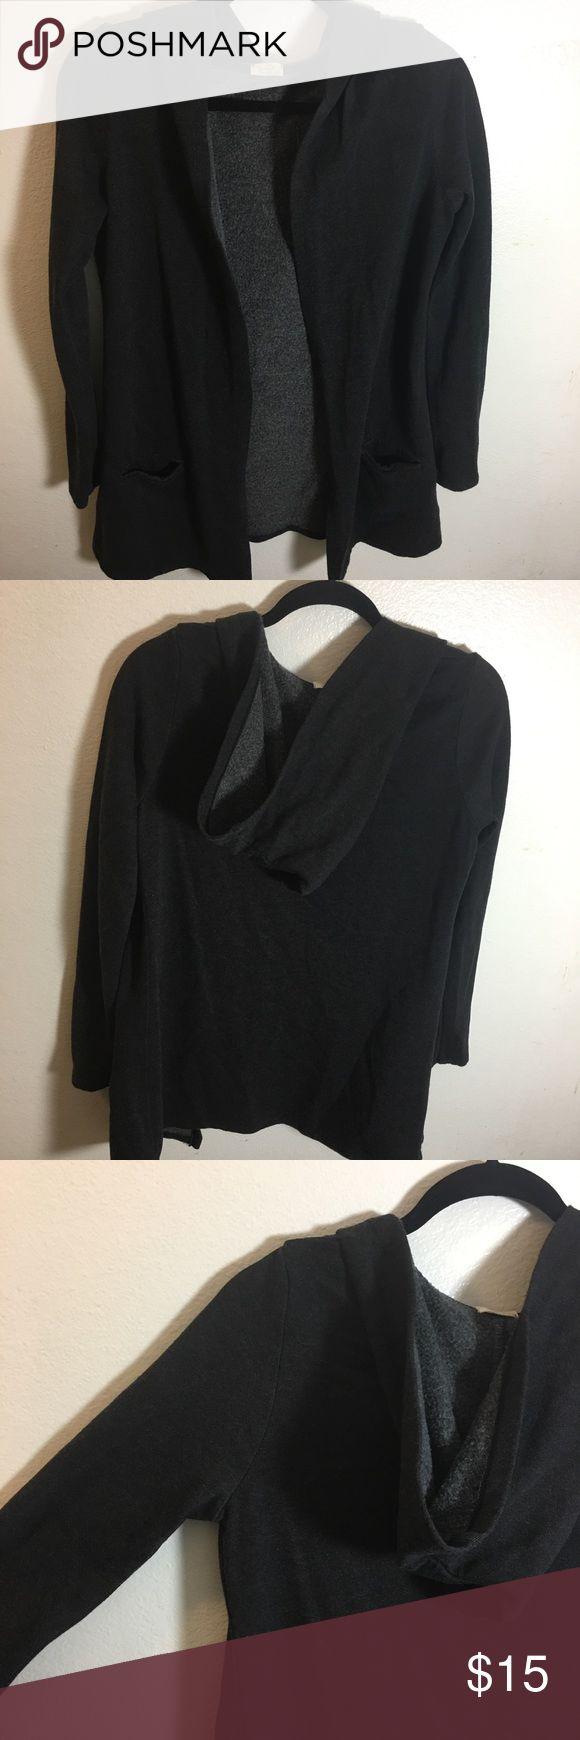 "Brandy Melville cardigan Dark grey ""John Galt"" by Brandy Melville cardigan, BNWOT, never worn Brandy Melville Sweaters Cardigans"